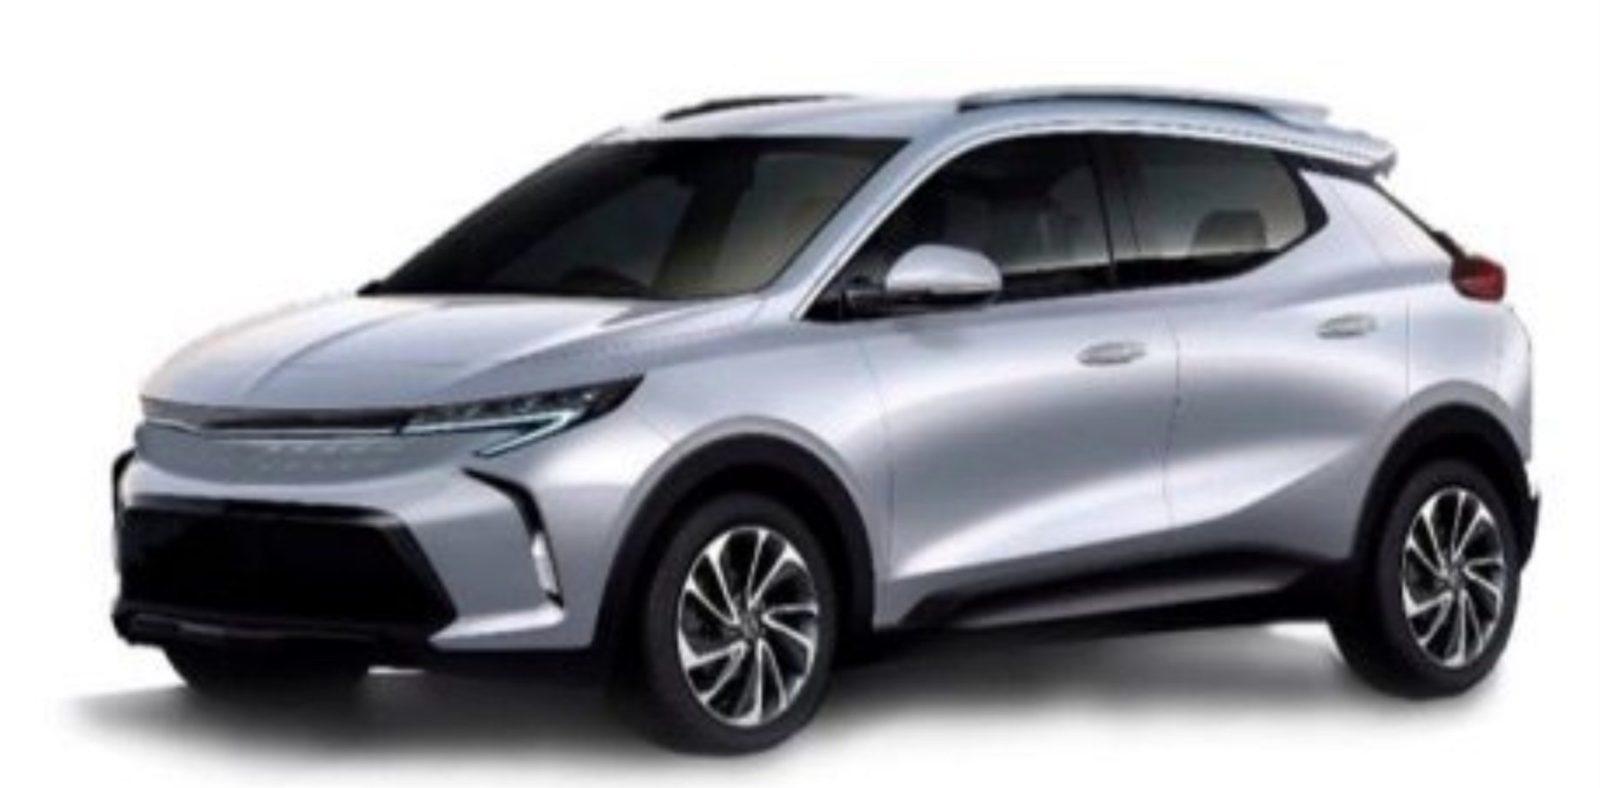 Gm Files Bolt Euv Trademark Hinting At New Electric Car